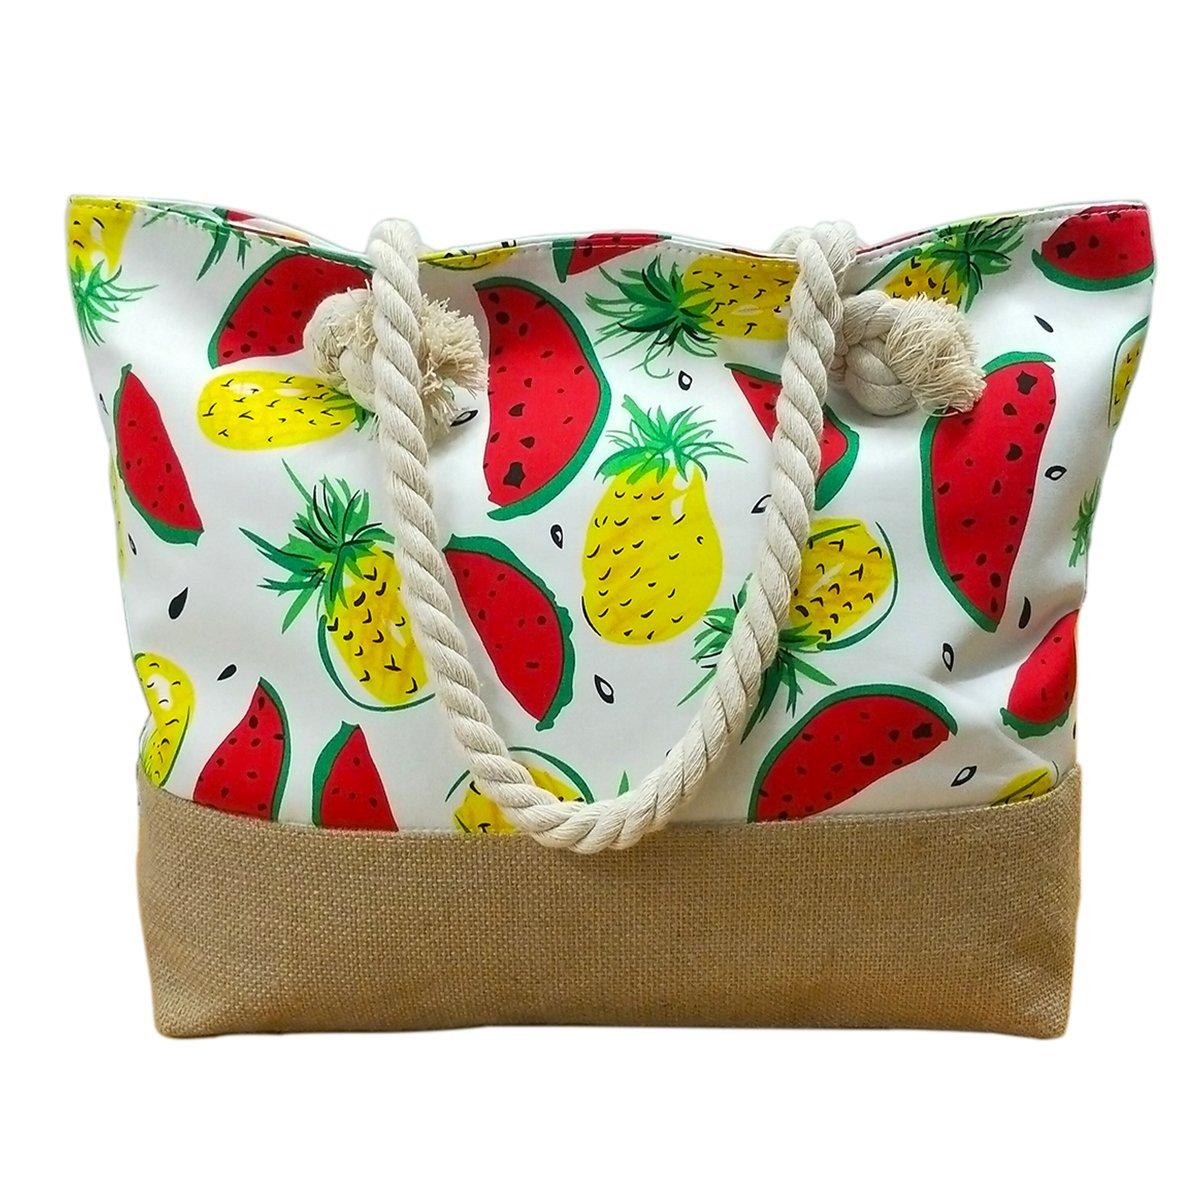 We We Fashion Beach Bag Waterproof Canvas Tote Straw Bag - Large We We Denim Jeans Beach Bag Handmade Duffel Bag